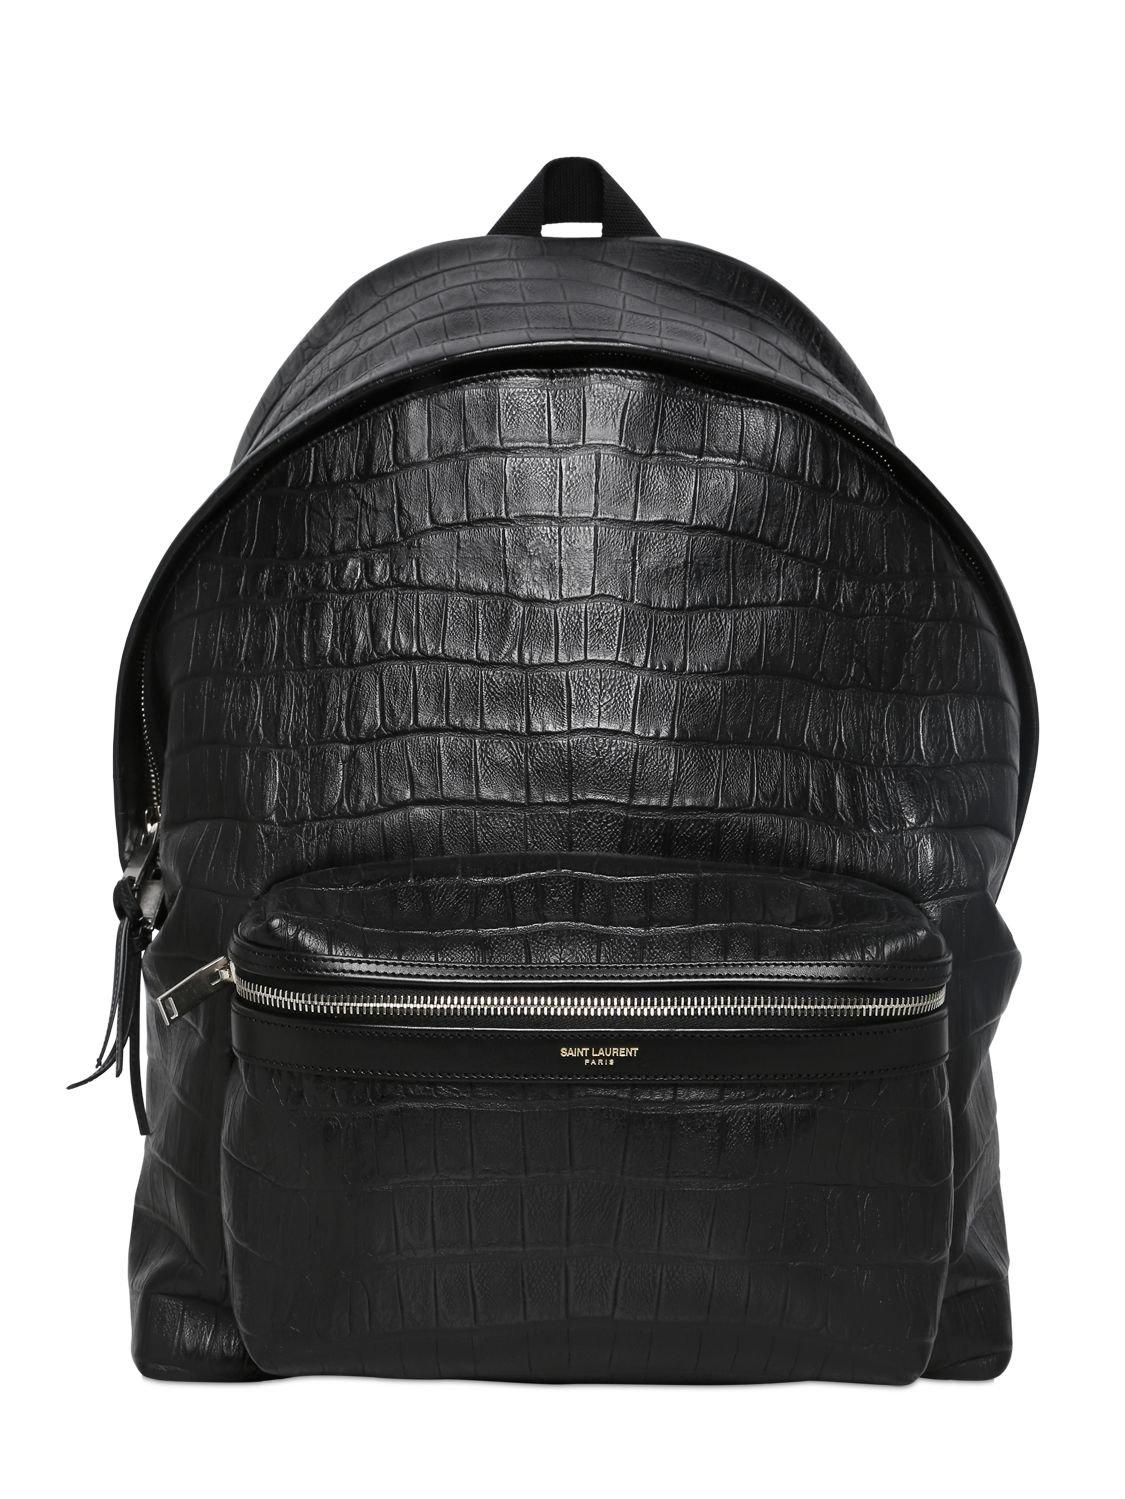 Saint Laurent Croc Embossed Leather Backpack In Black For